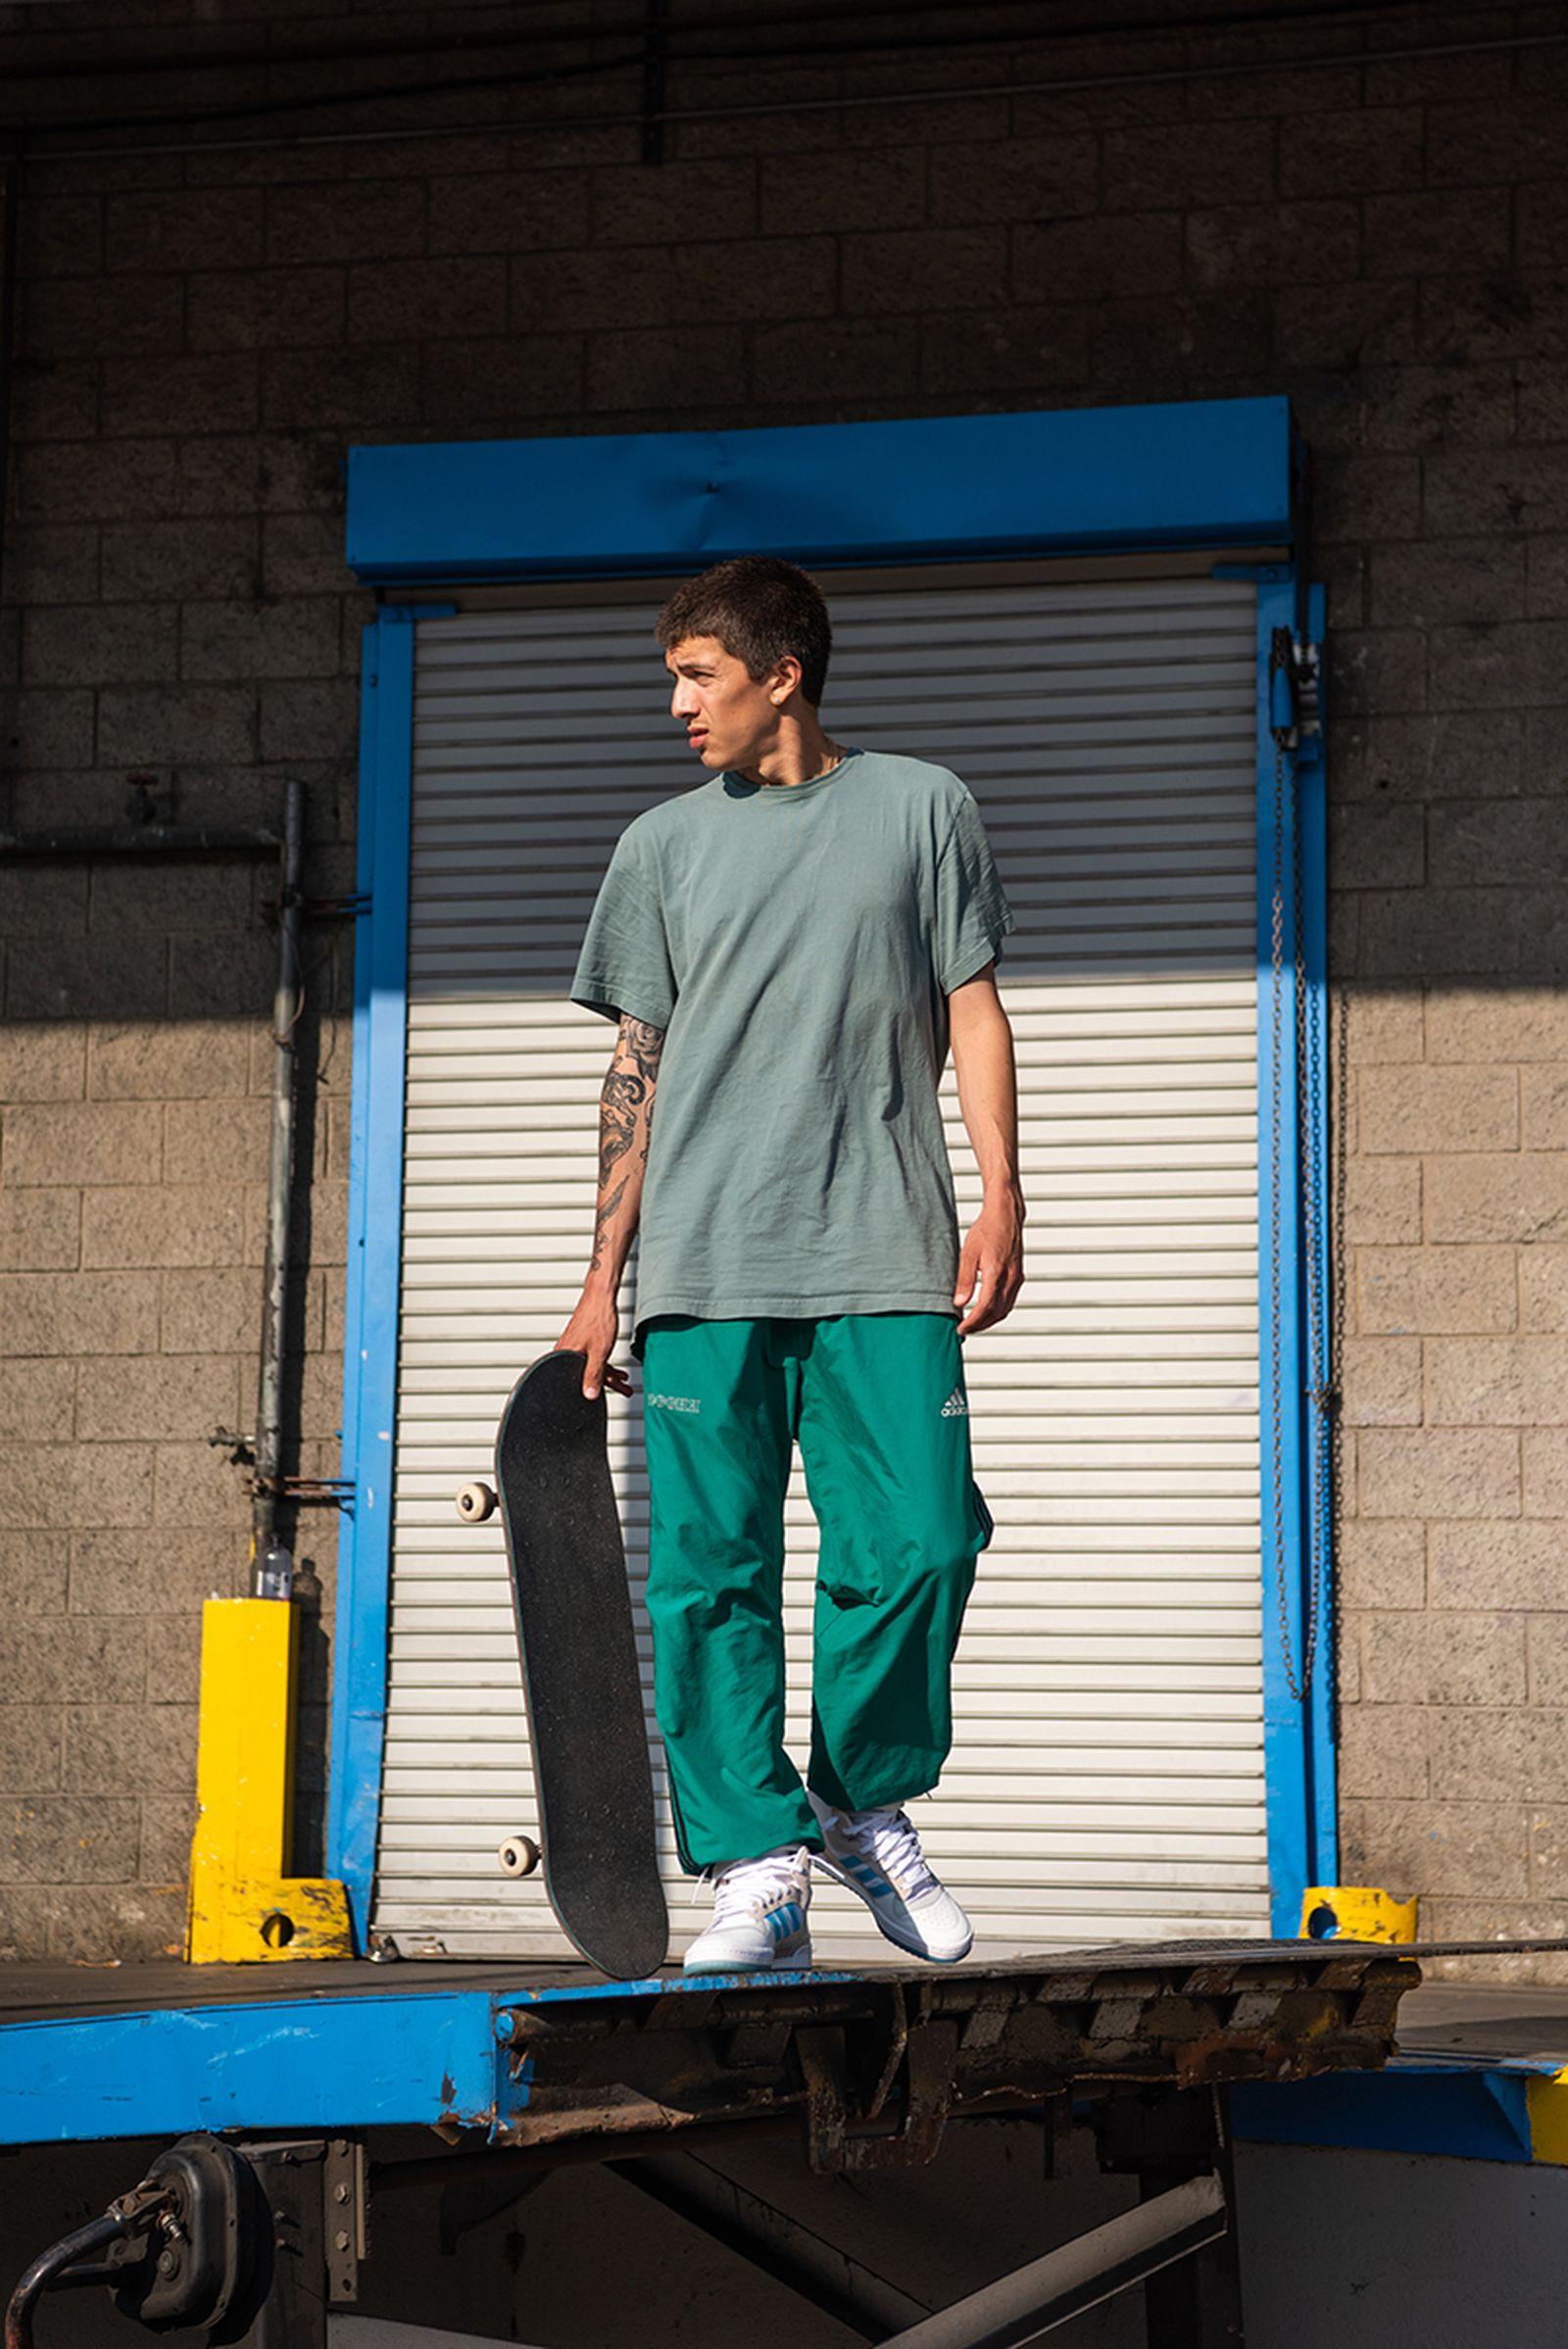 adidas-skateboarding-forum-84-adv-diego-najera-release-date-price-10